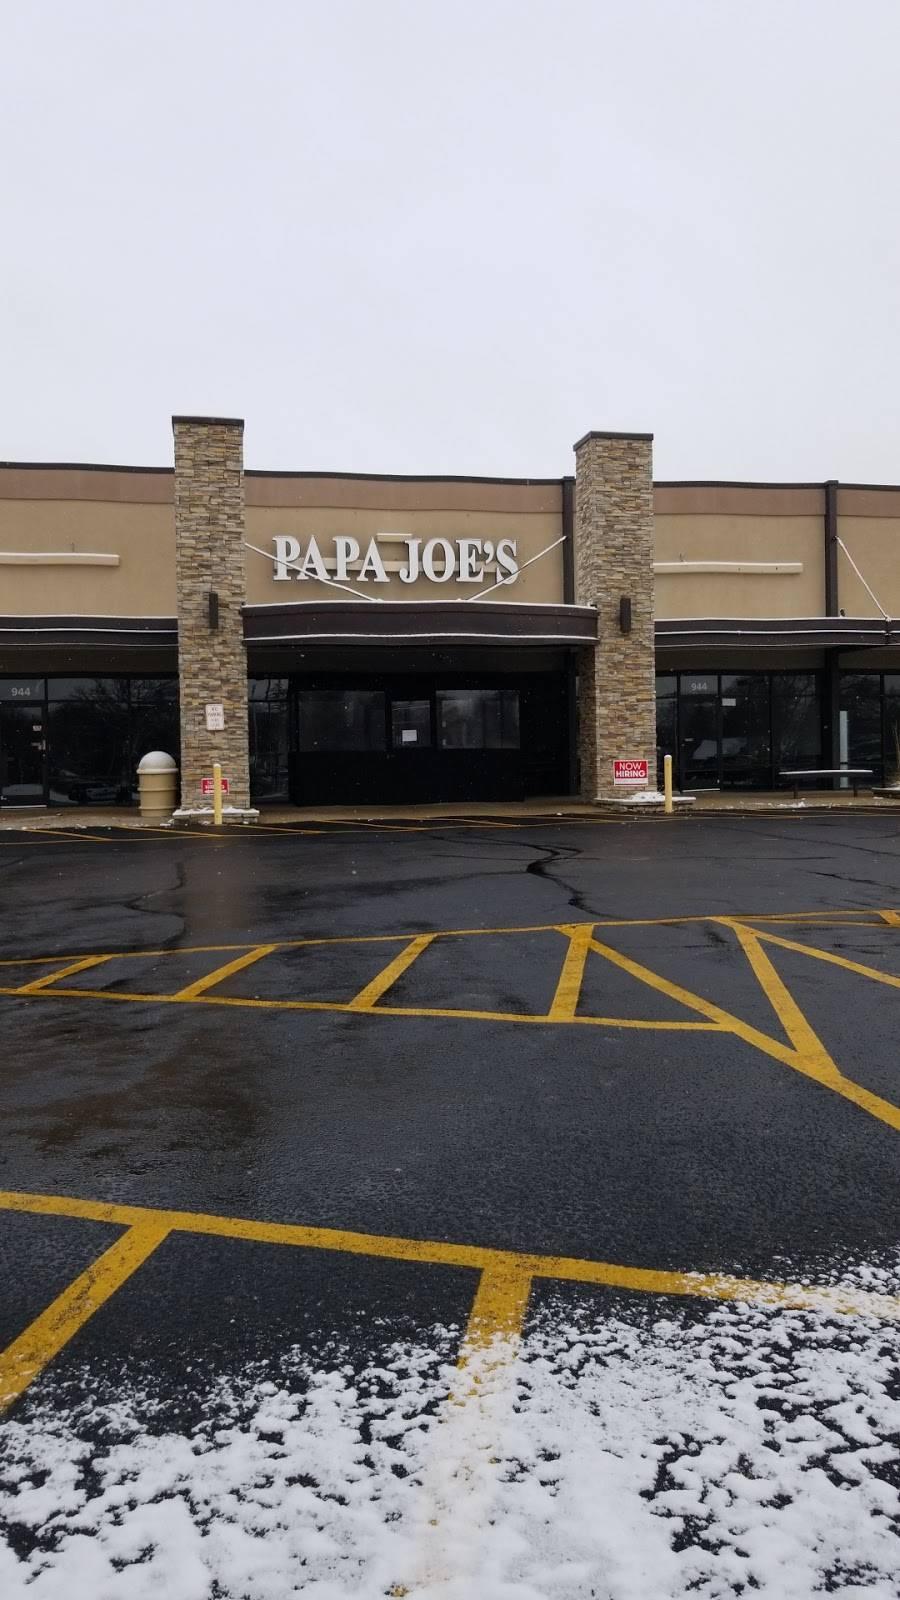 Papa Joes | restaurant | 944 E 9th St, Lockport, IL 60441, USA | 8158389099 OR +1 815-838-9099